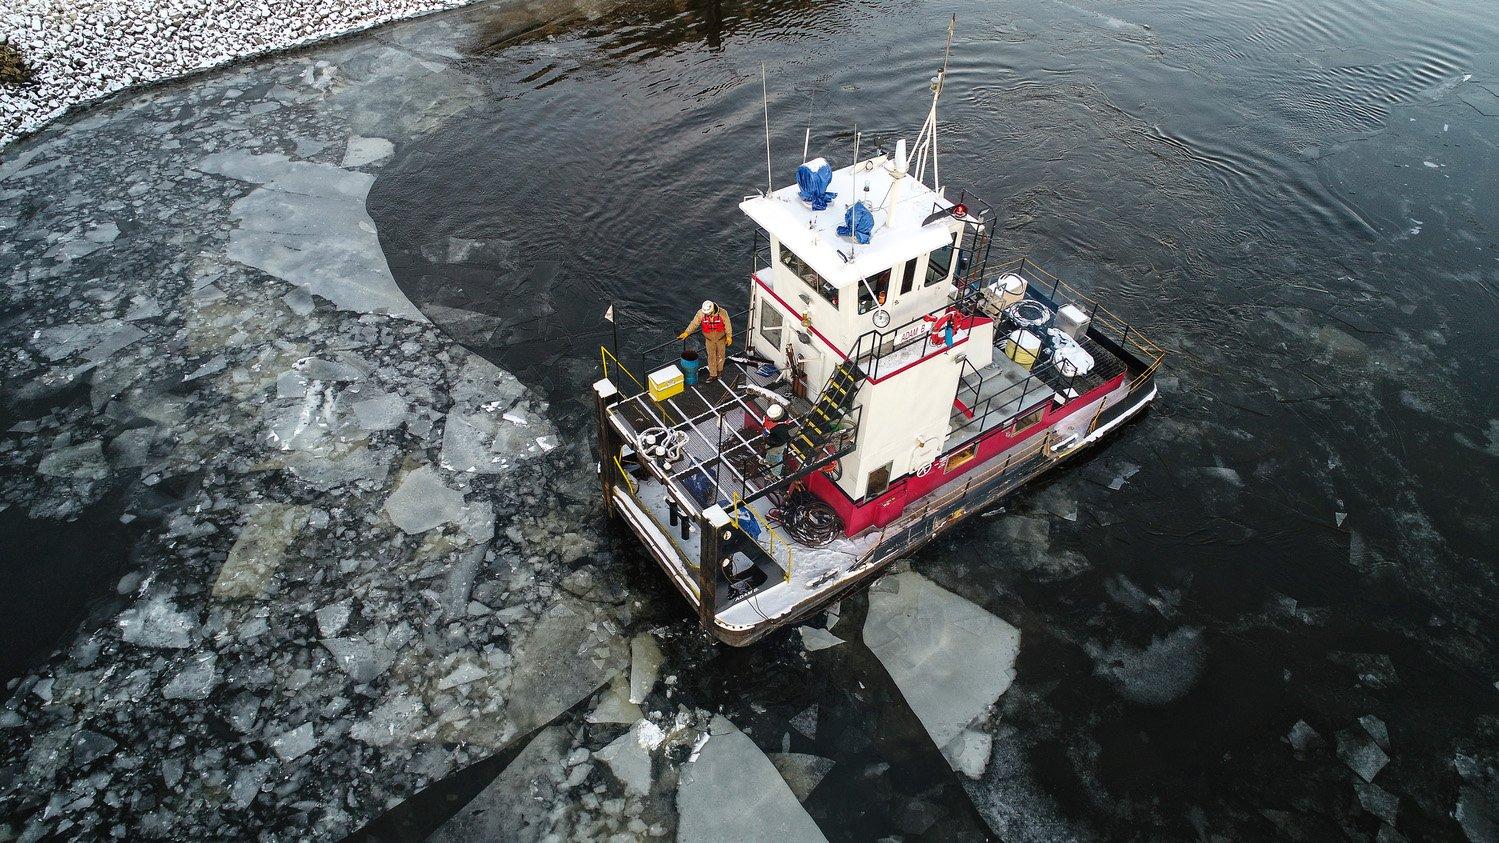 Brennan's team travels in an ice filled waterway